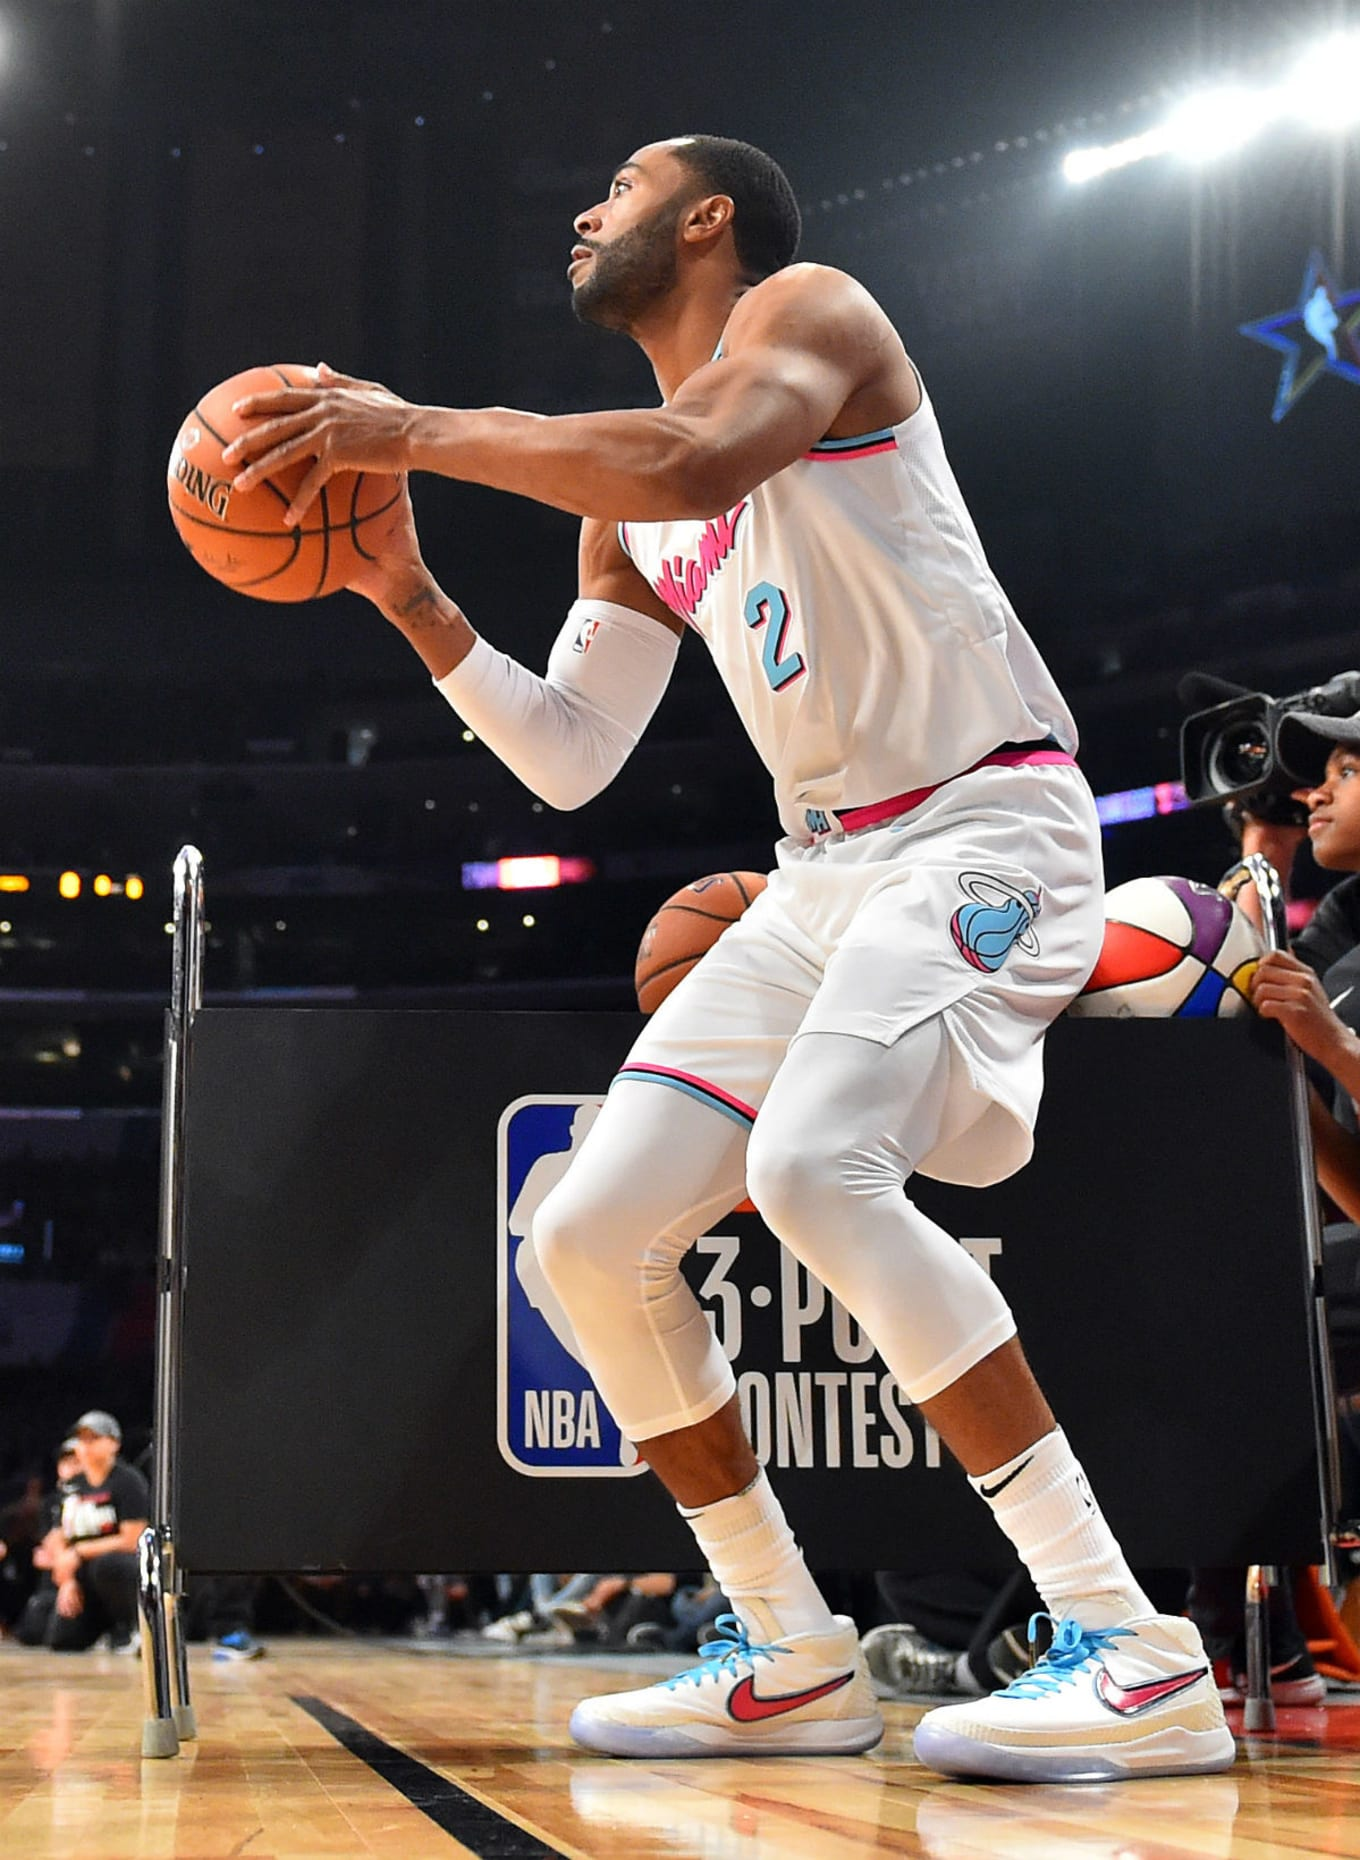 44b7c21ccc9d Bradley Beal Nike React Hyperdunk Low - NBA Three-Point Contest 2018 ...